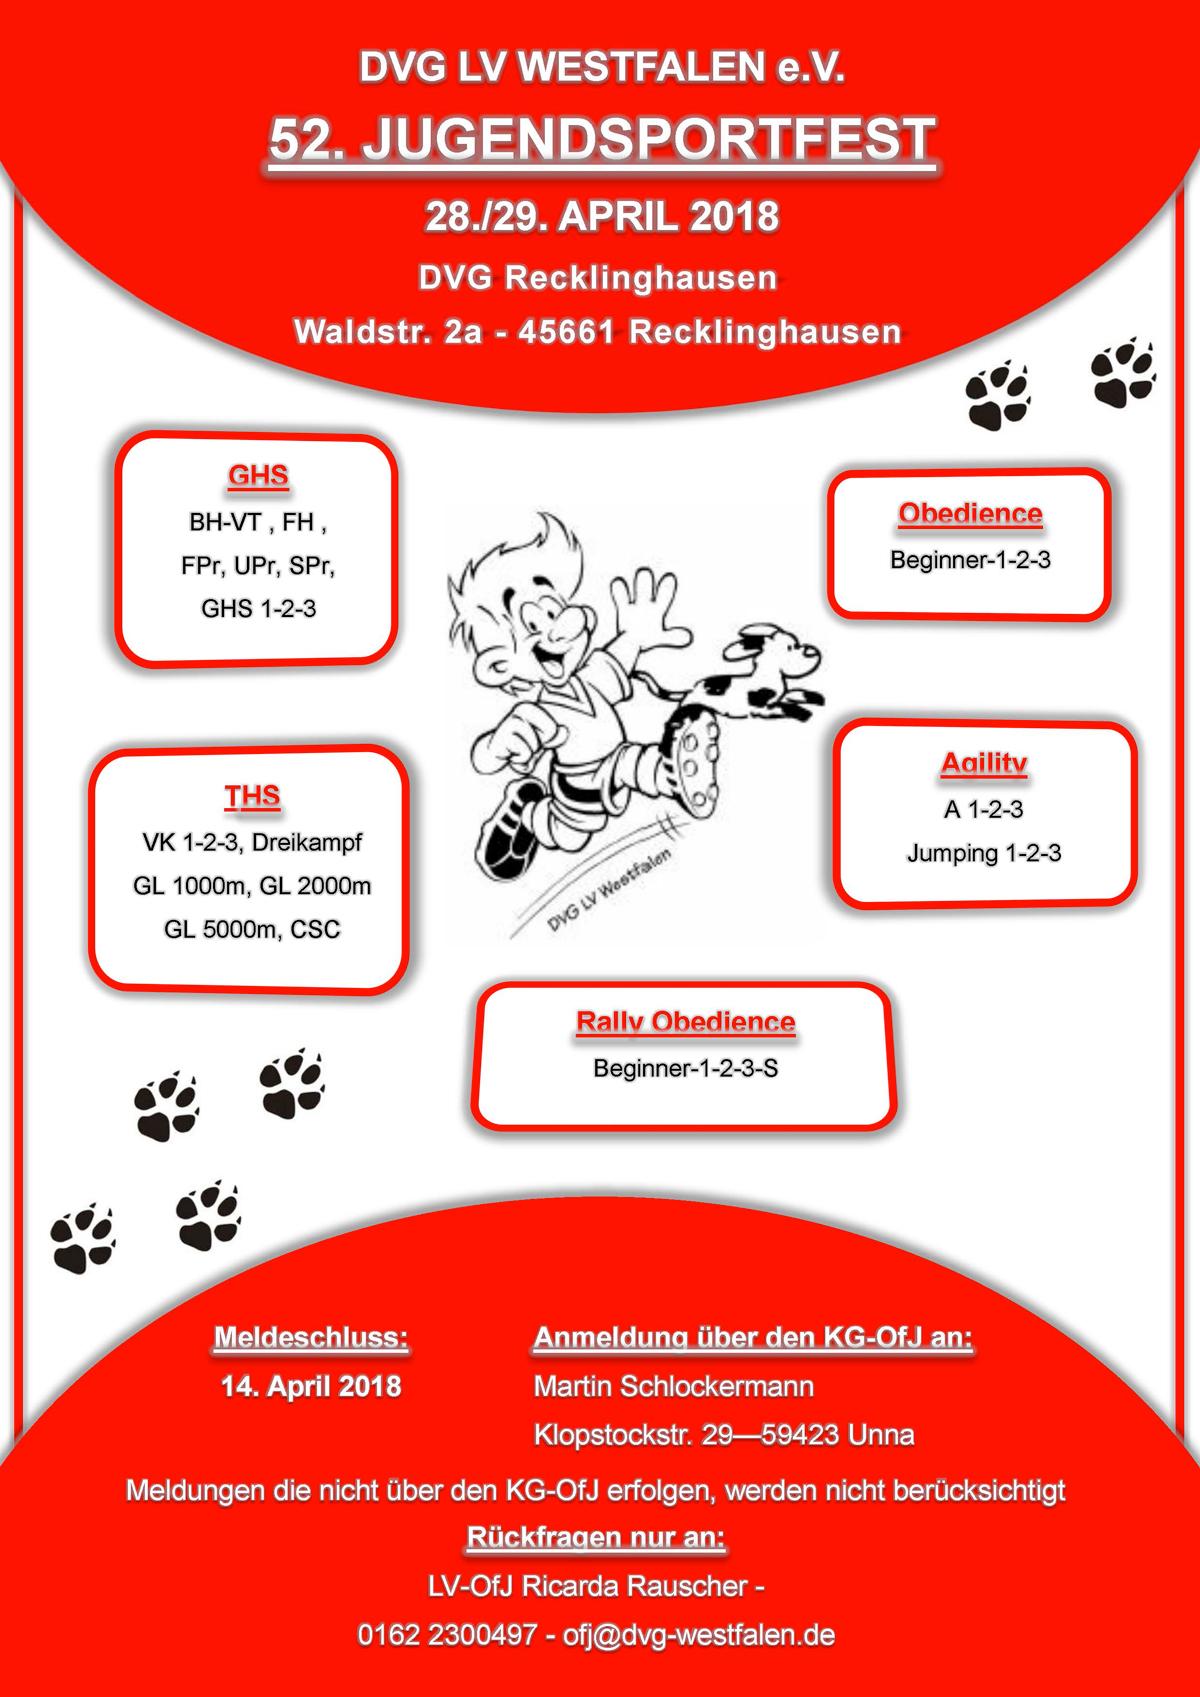 LV Jugendsportfest 28-29. April MV Recklinghausen @ MV Recklinghausen | Recklinghausen | Nordrhein-Westfalen | Deutschland